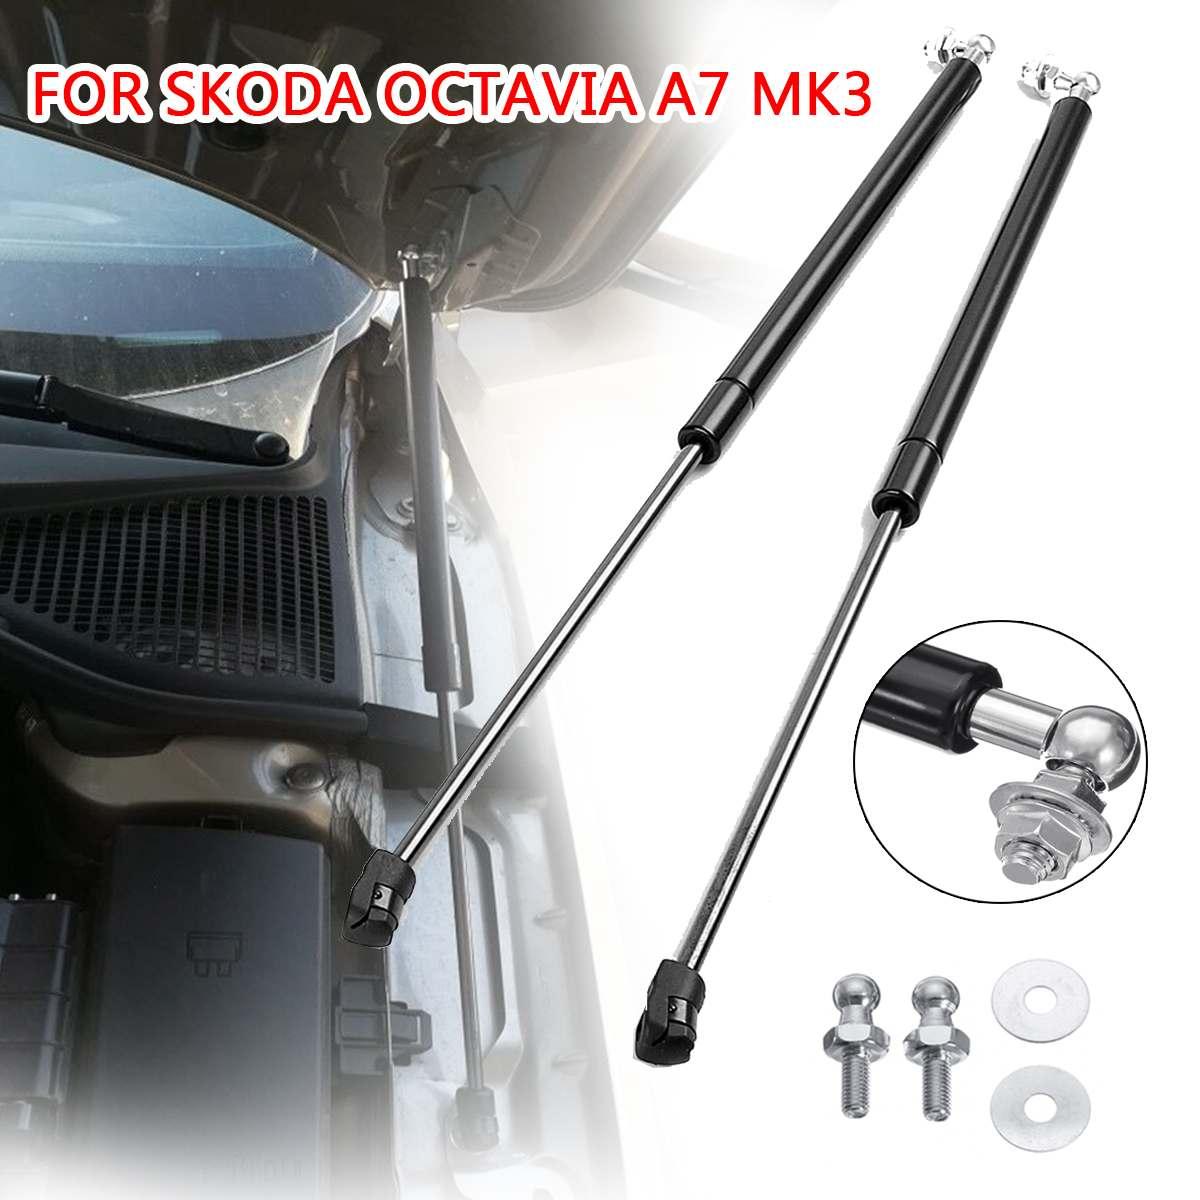 2 uds. Amortiguador trasero de Gas para coche, soporte amortiguador para Skoda Octavia A7 MK3